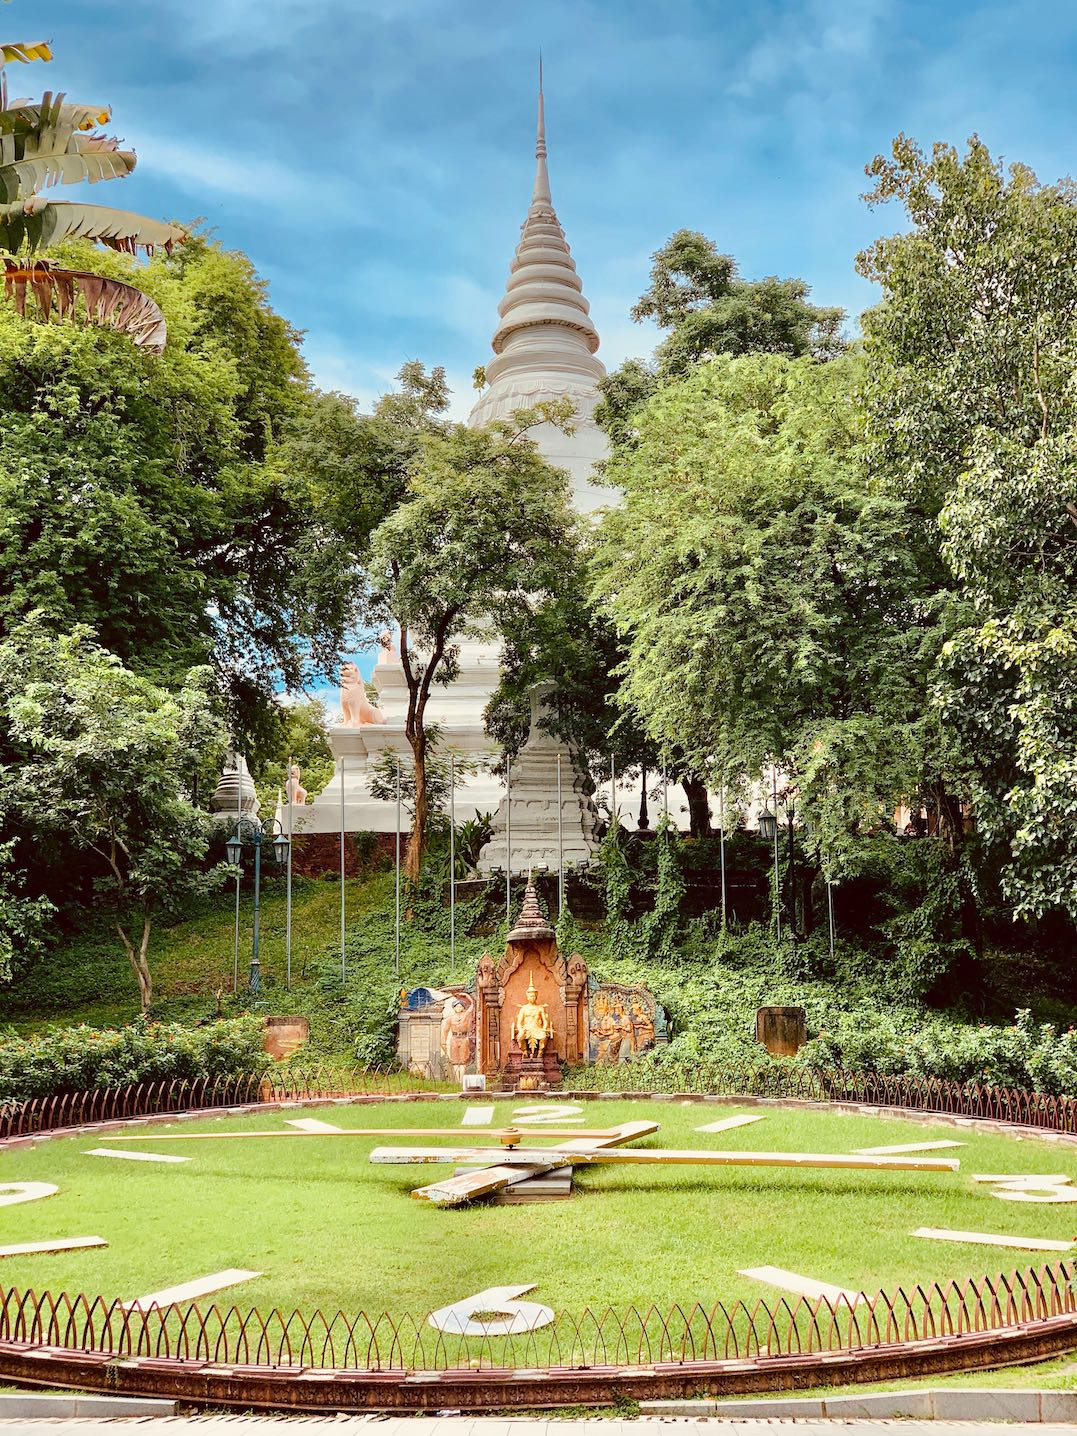 giant clock Phnom Penh